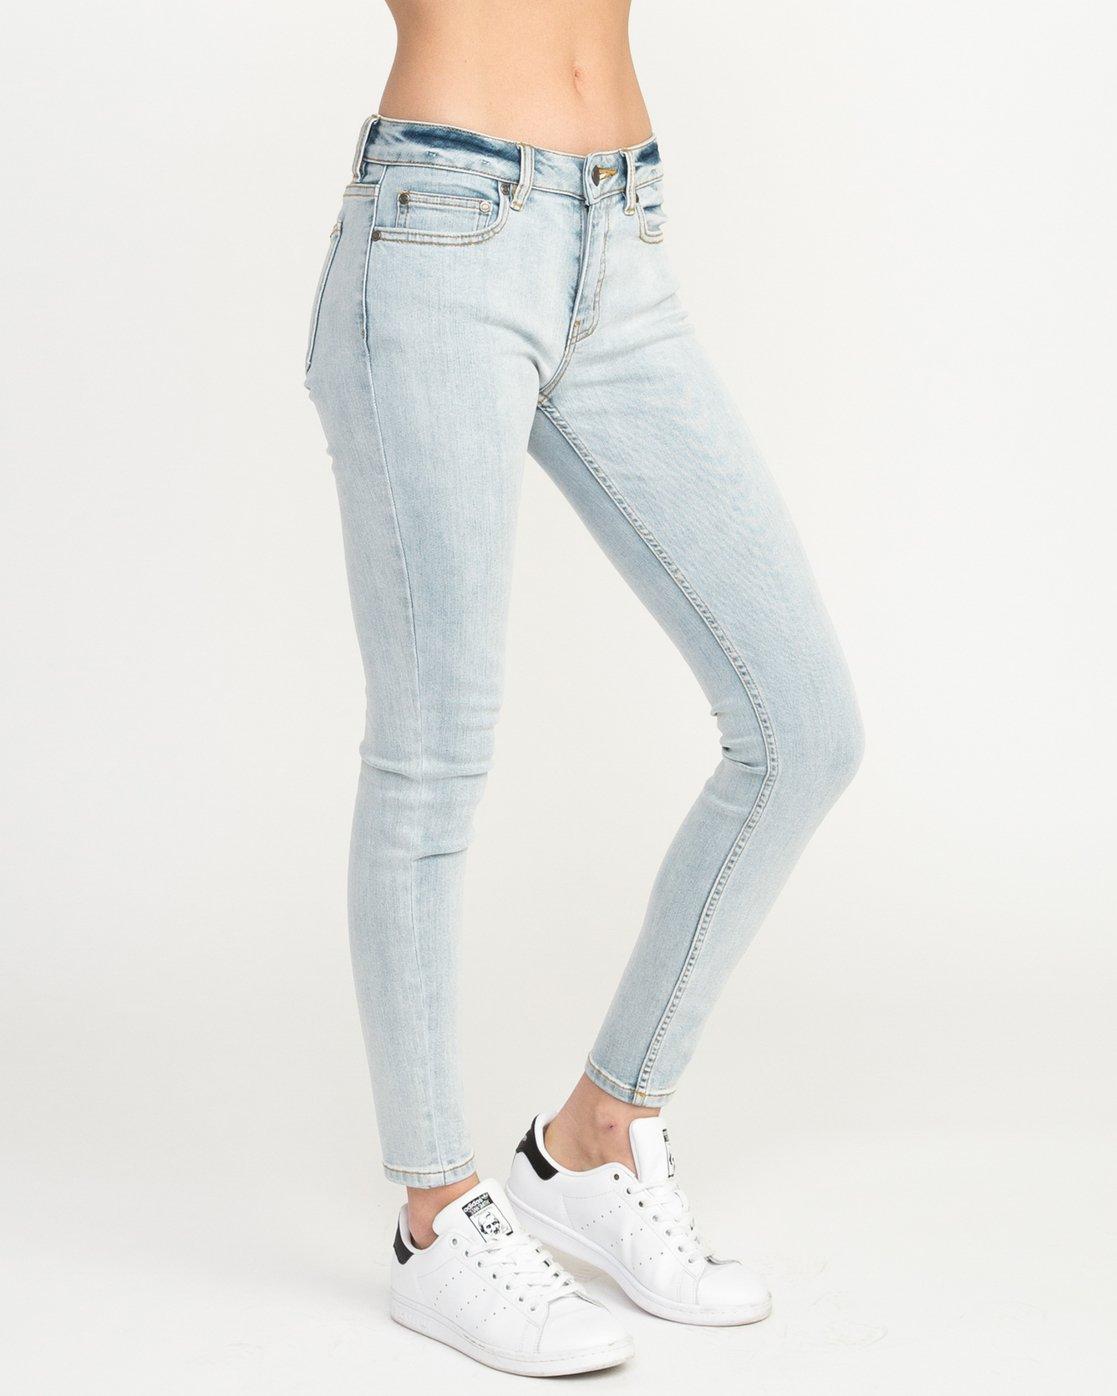 5 Dayley Mid Rise Denim Jeans White WCDP02DA RVCA